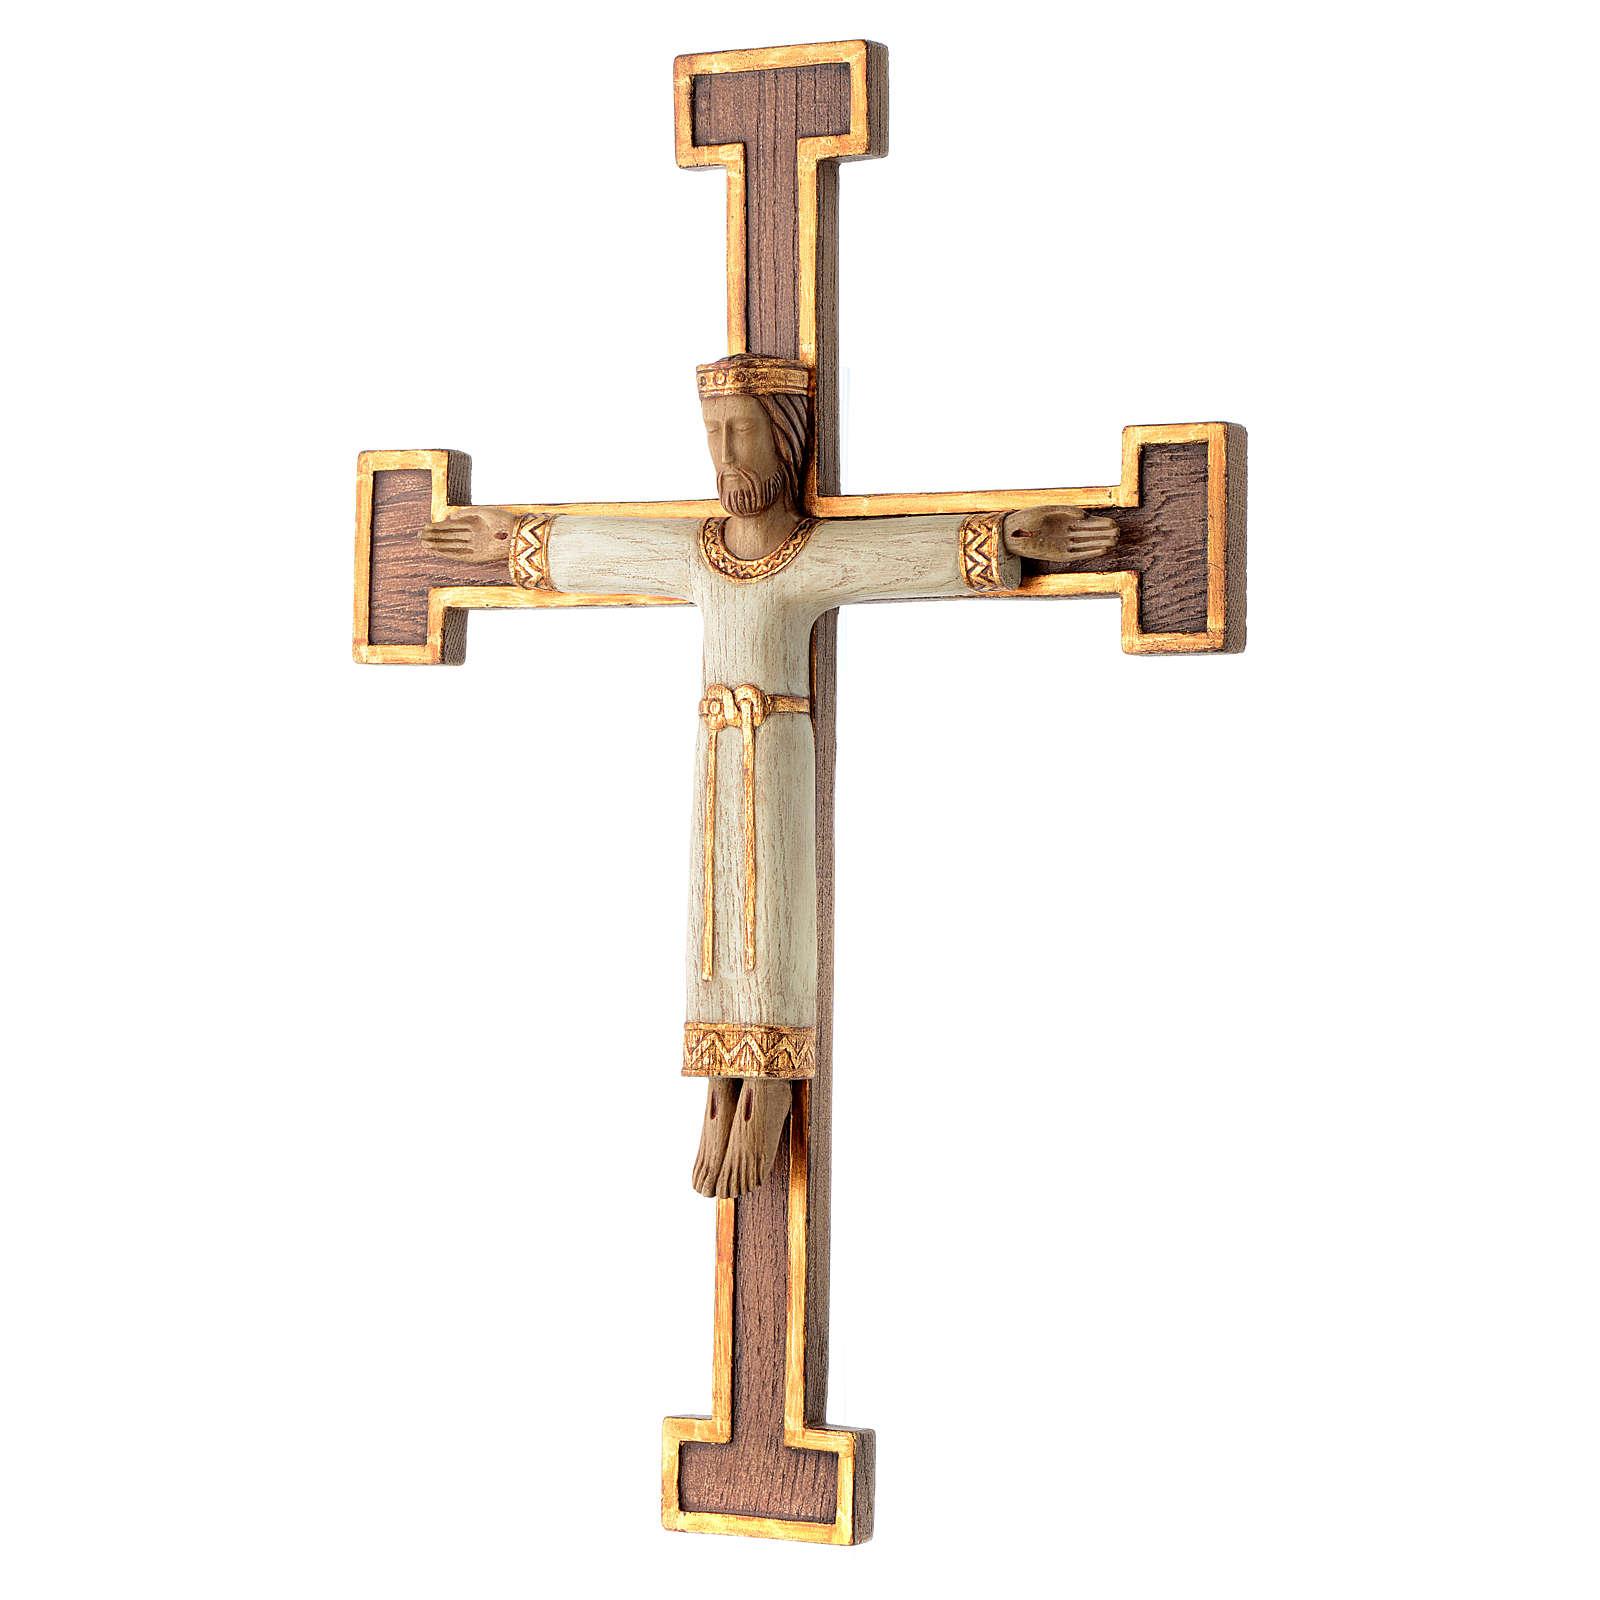 Jesus Christ, Priest and King 4